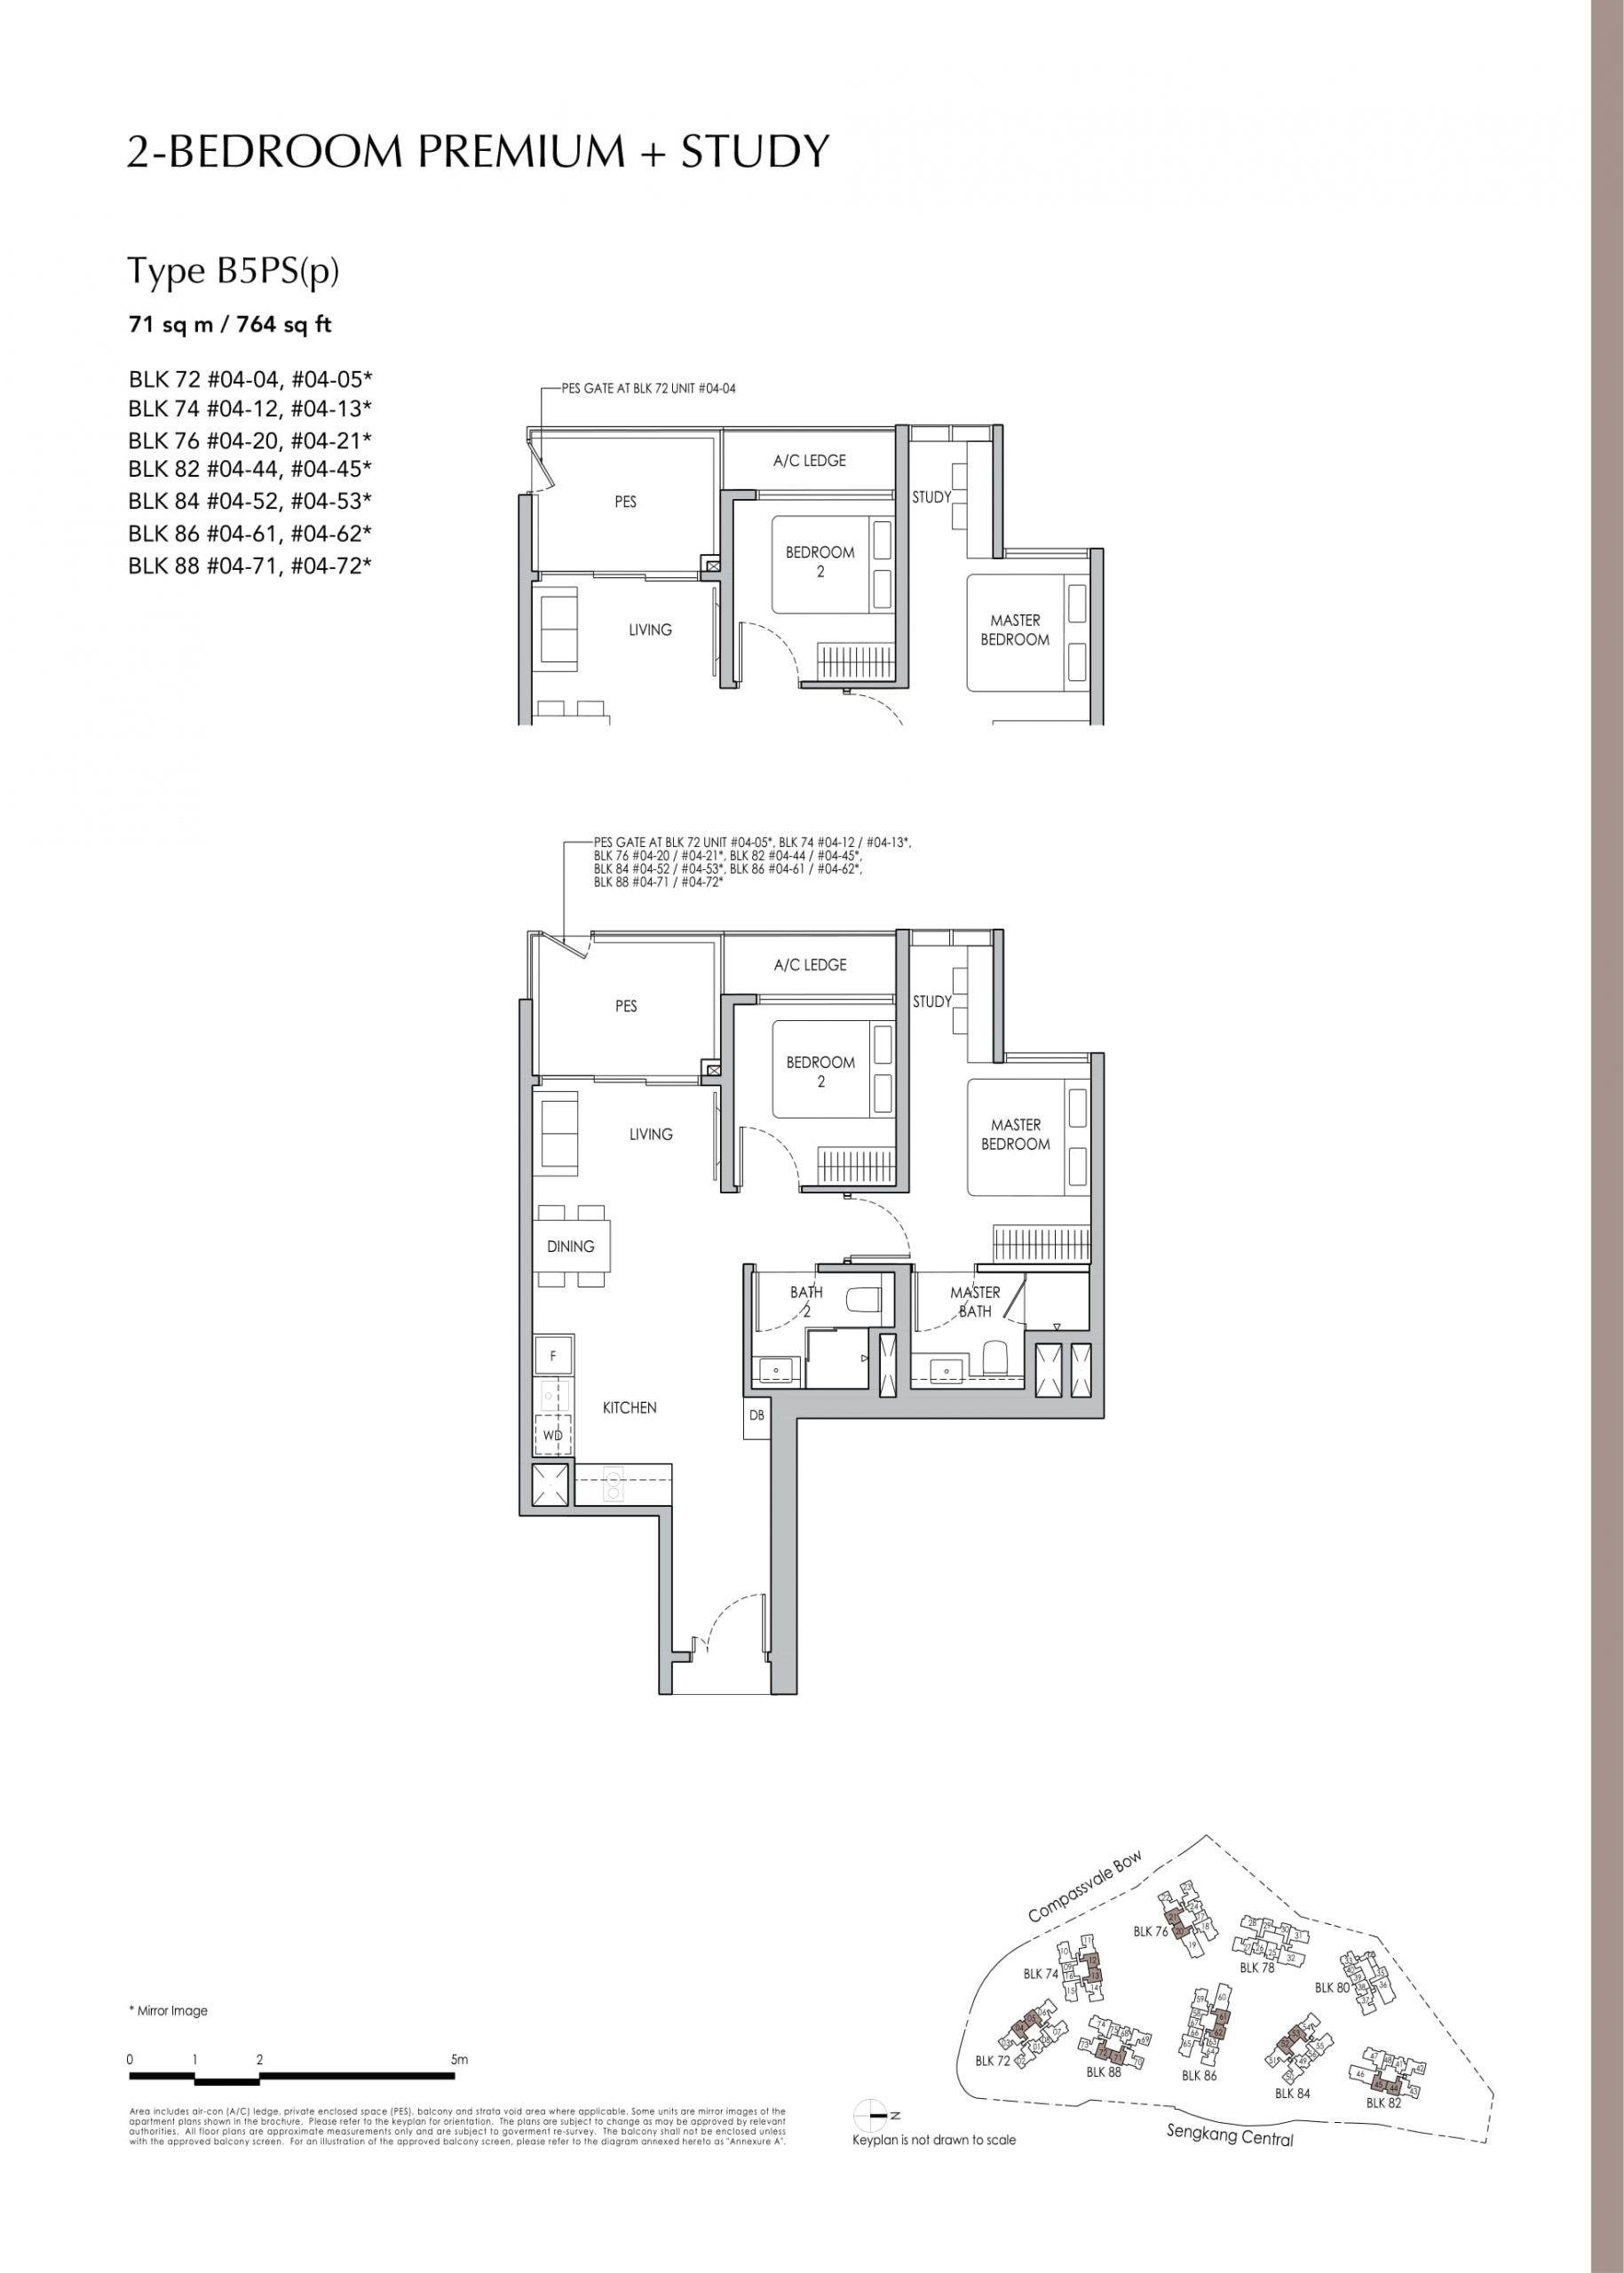 Sengkang Grand Residences' two-bedroom premium + study